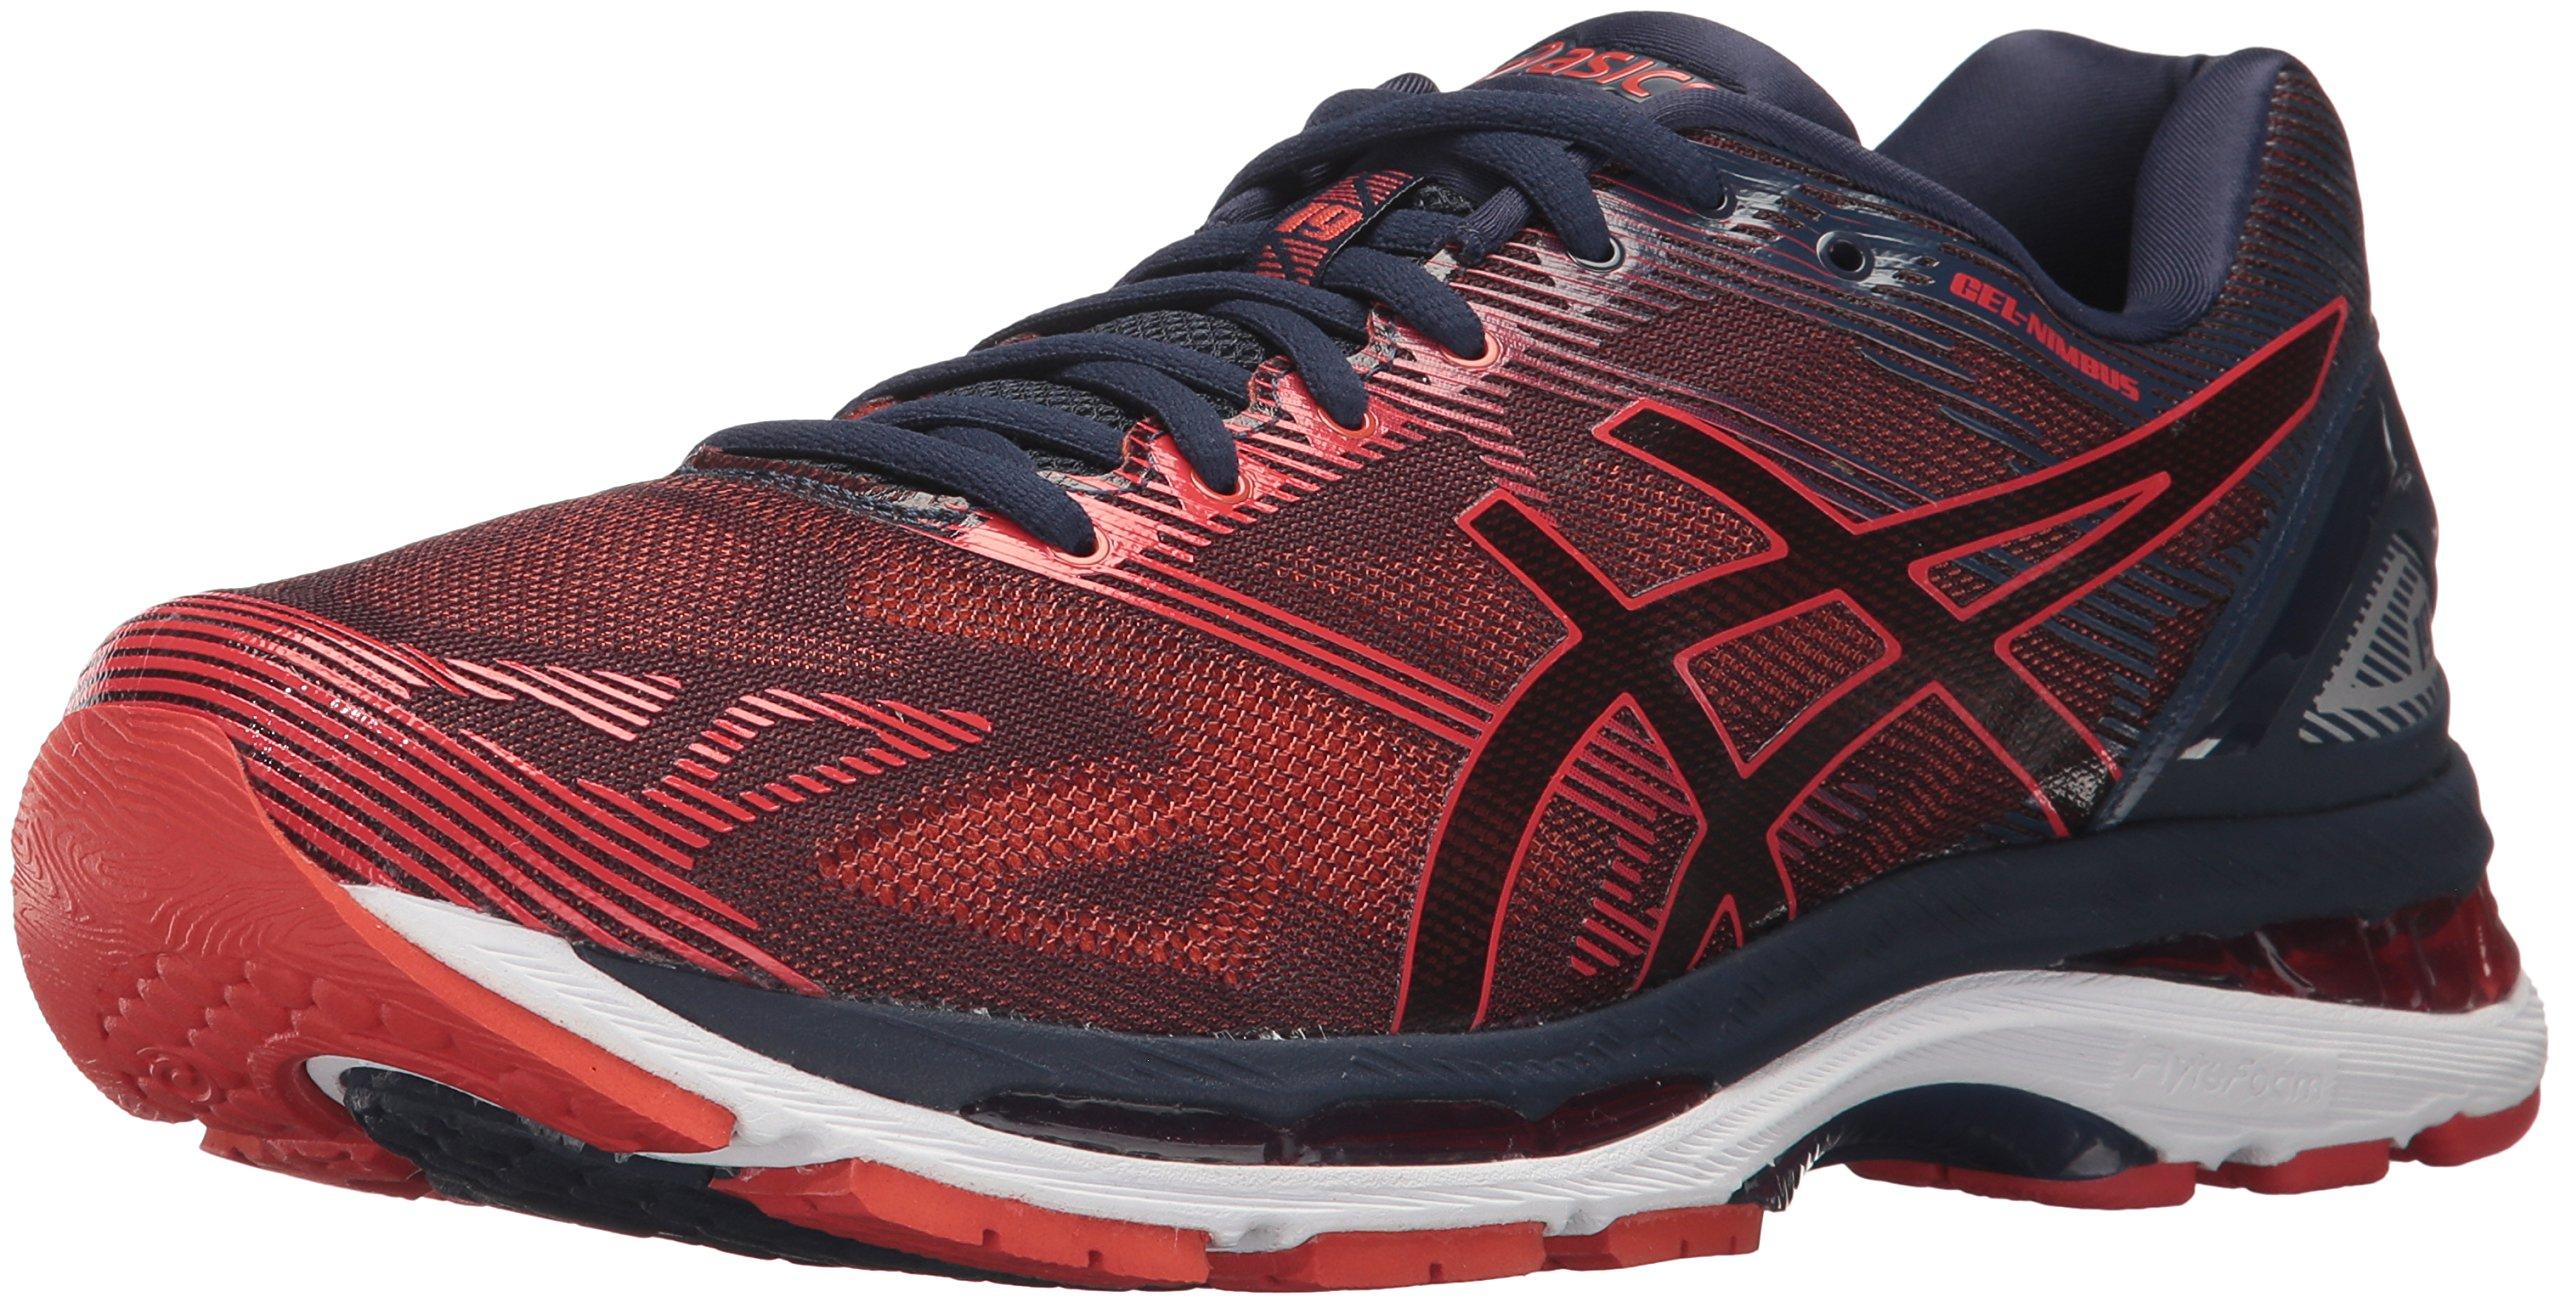 ASICS Men's Gel-Nimbus 19 Running Shoe, Peacoat/Red Clay/Peacoat, 13 Medium US